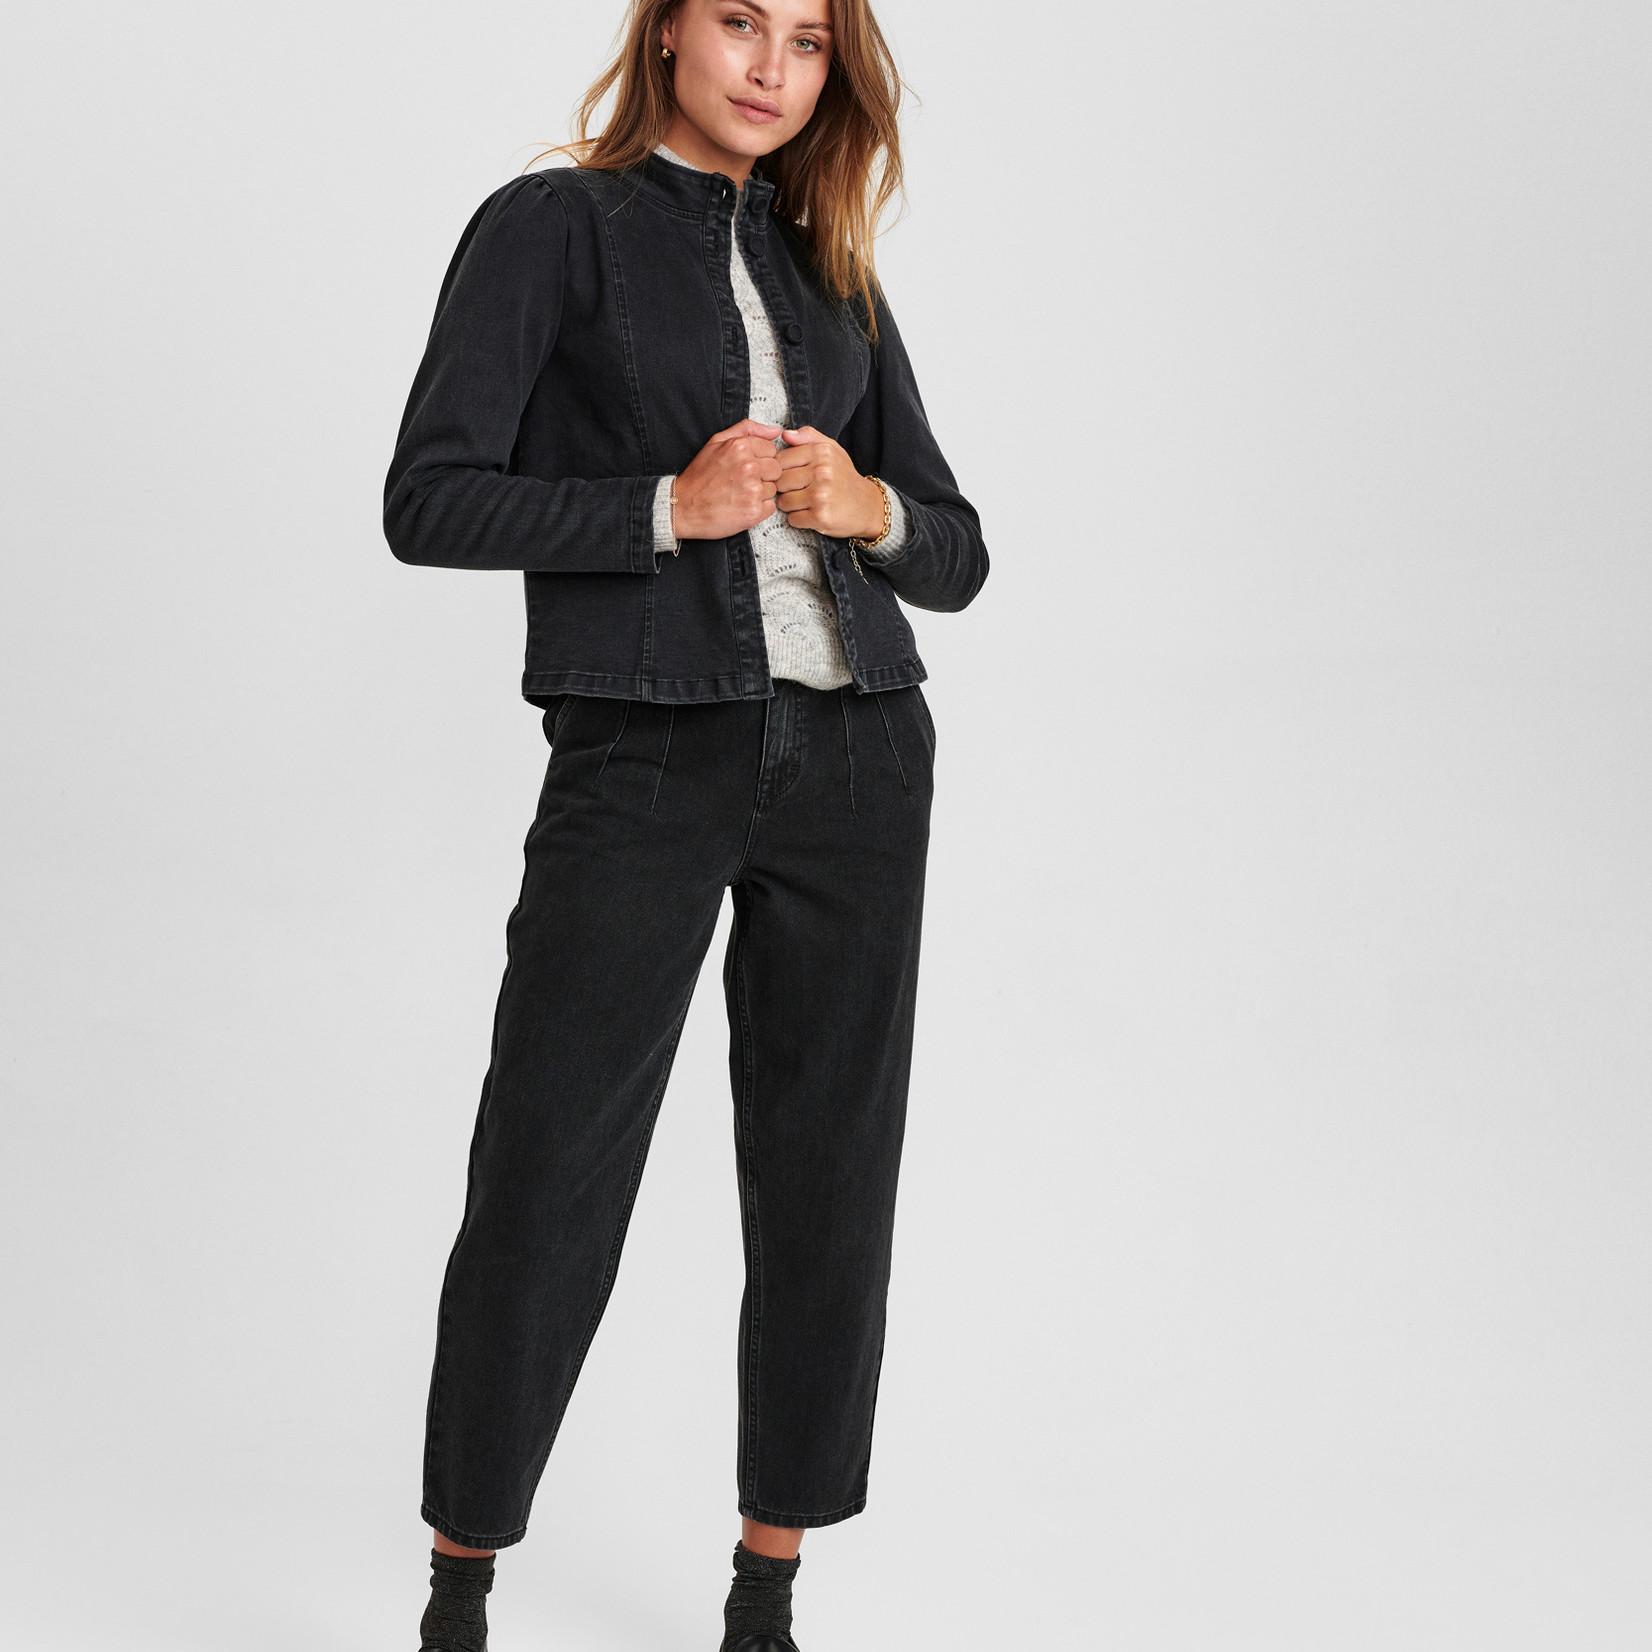 NÜMPH NUCHERYL SHIRT, denim blouse